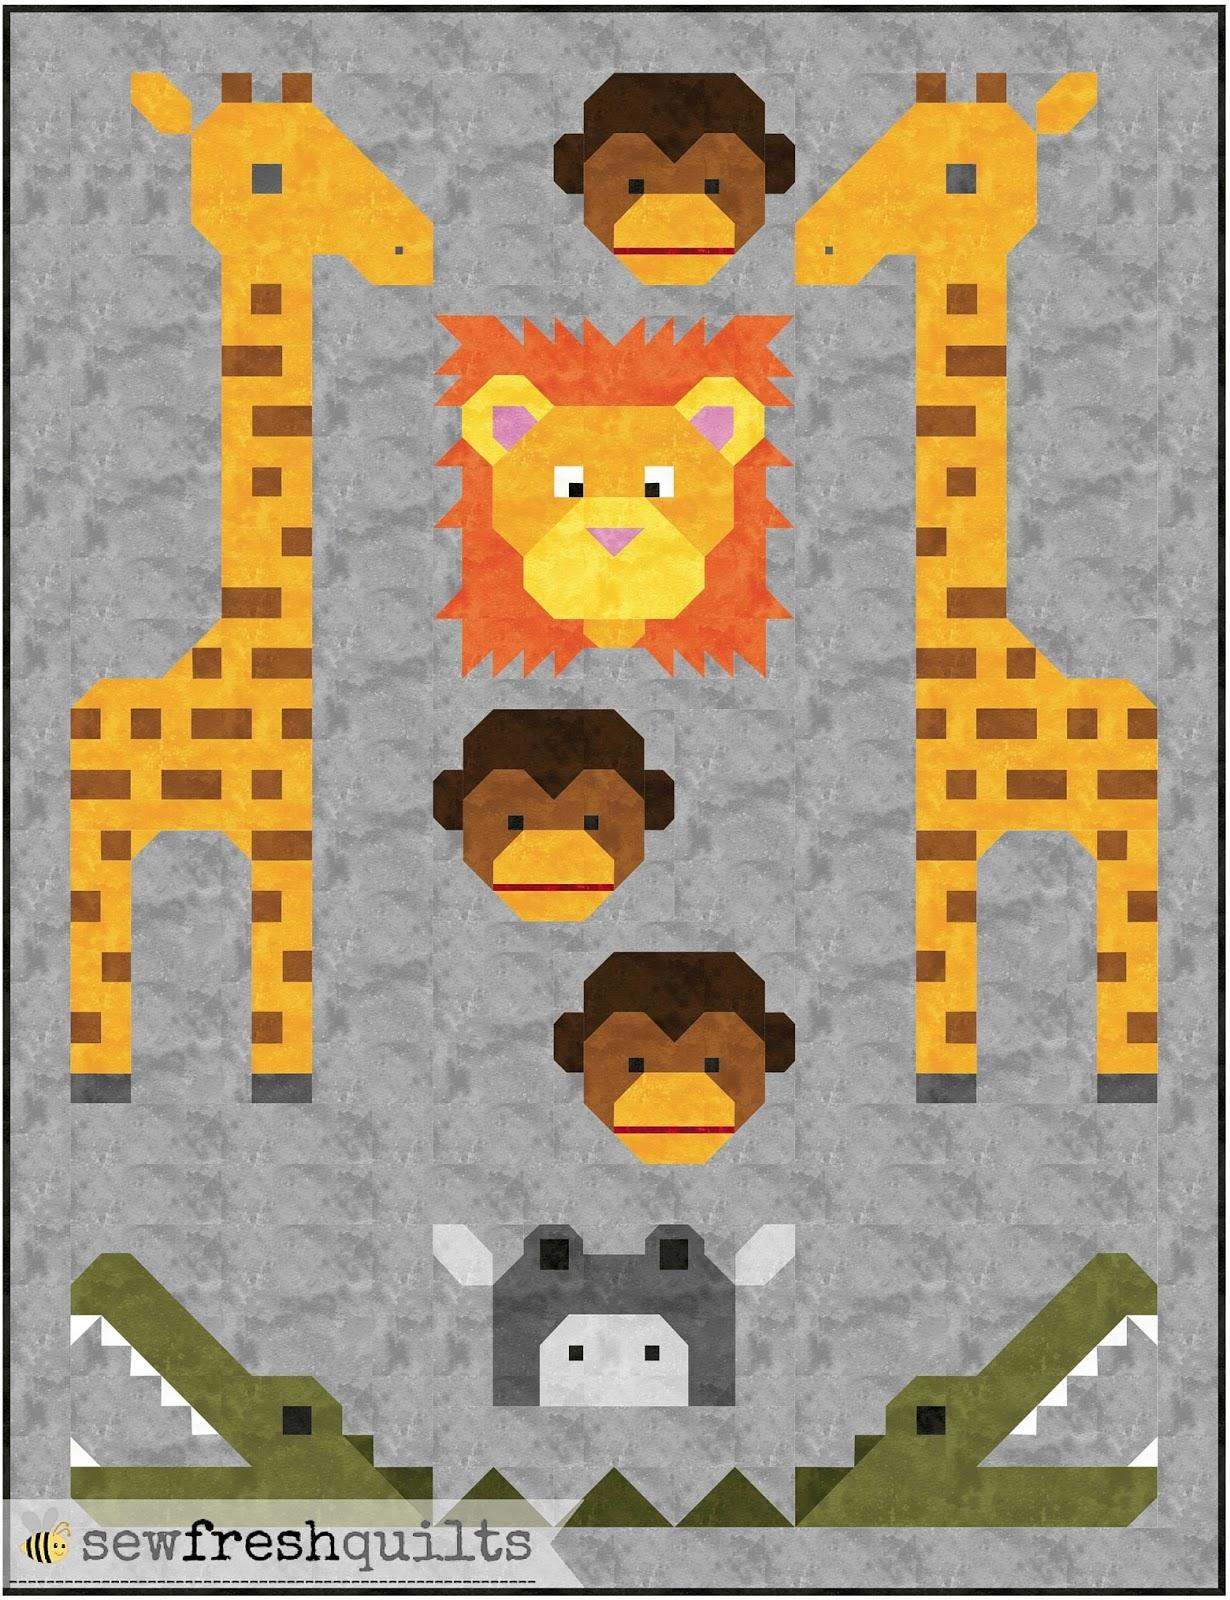 Sew Fresh Quilts: Jungle Friends quilt pattern - Coming Soon! : jungle quilt pattern - Adamdwight.com